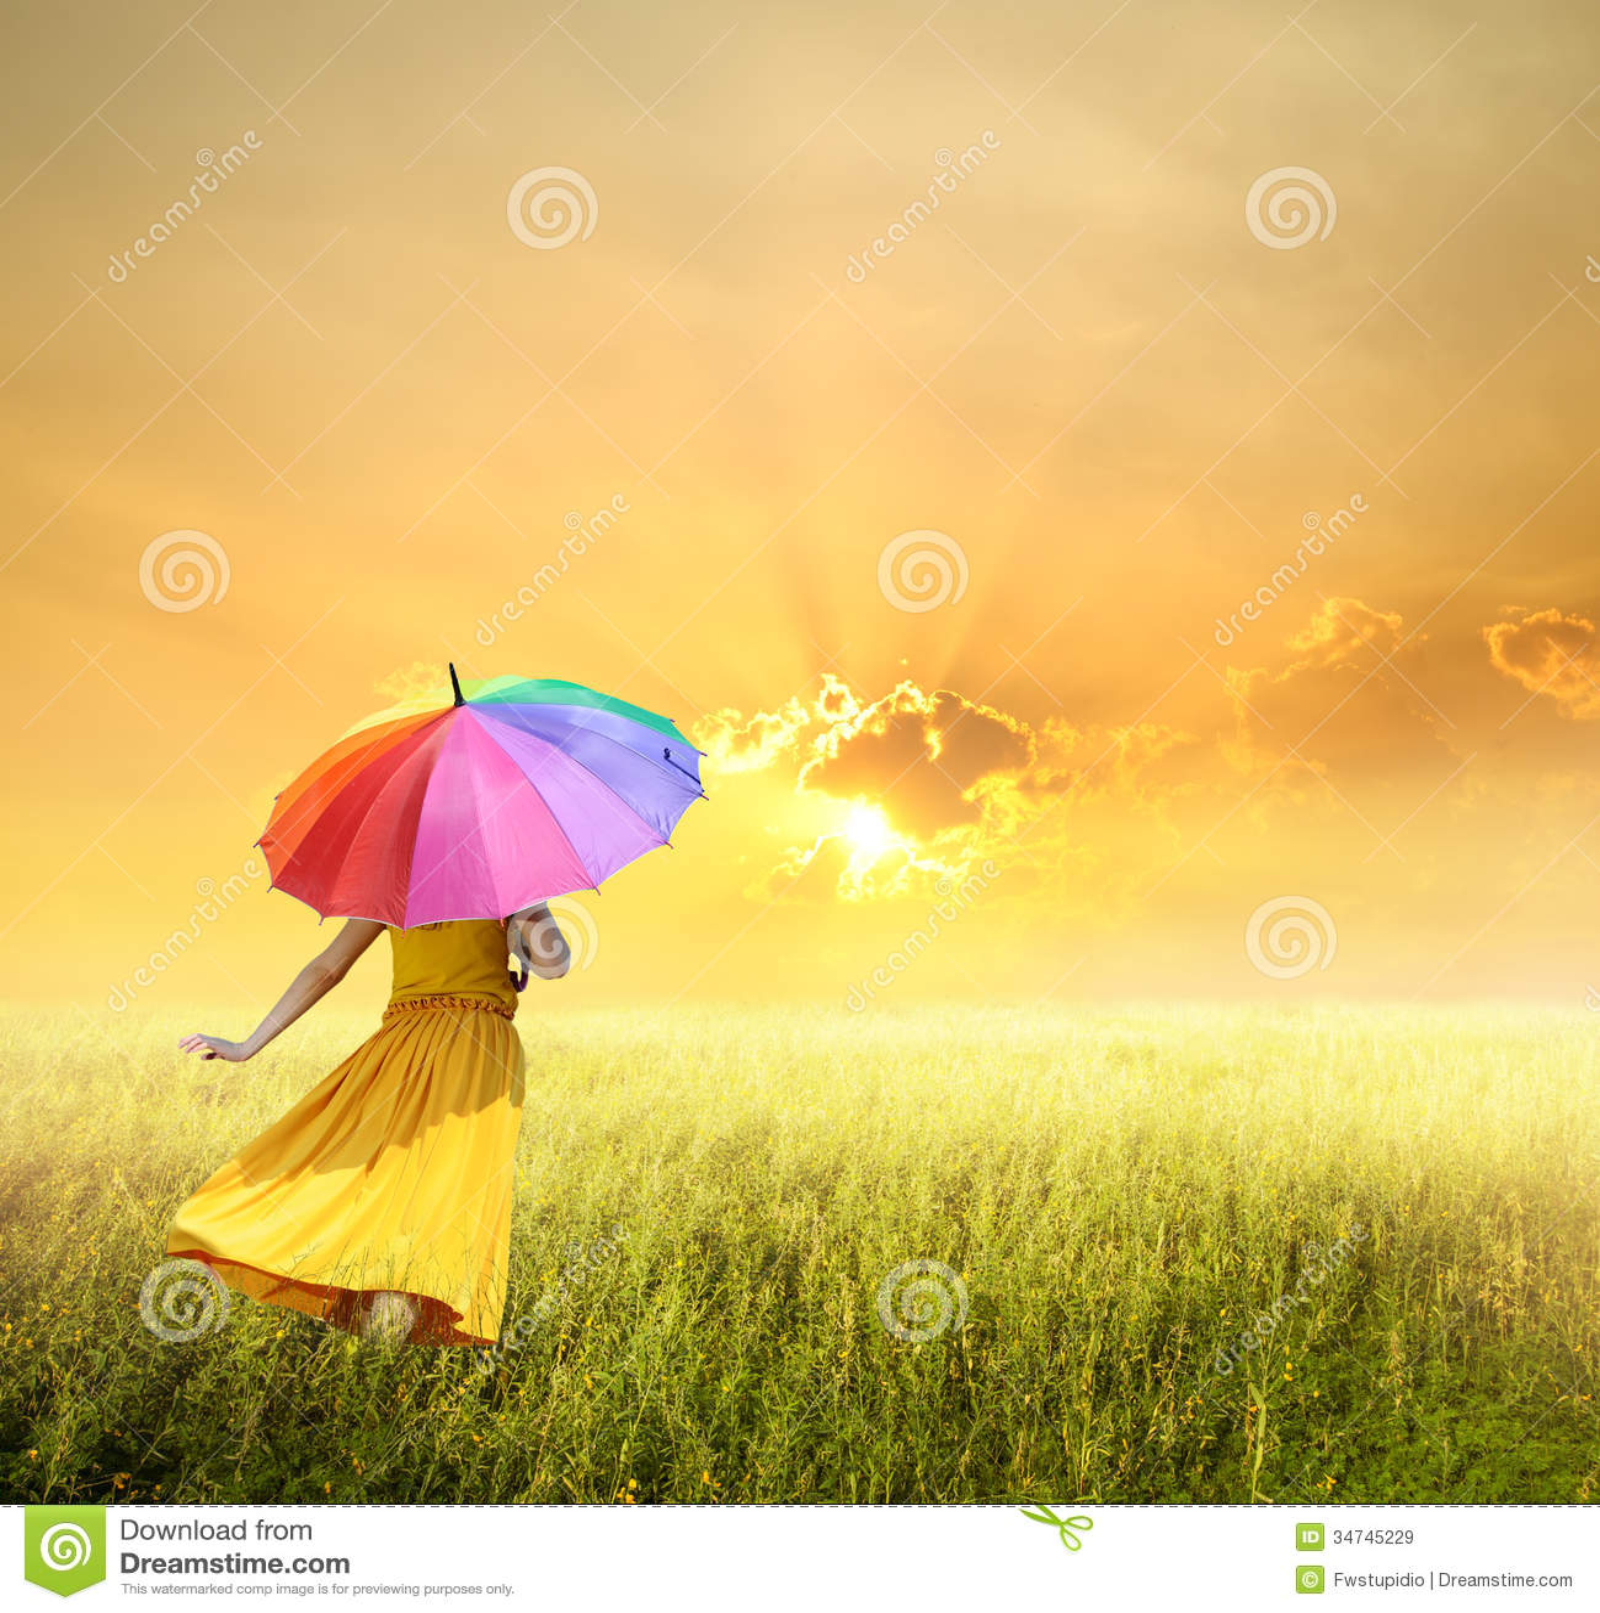 Beautiful Woman Holding Multicolored Umbrella In Green -5110